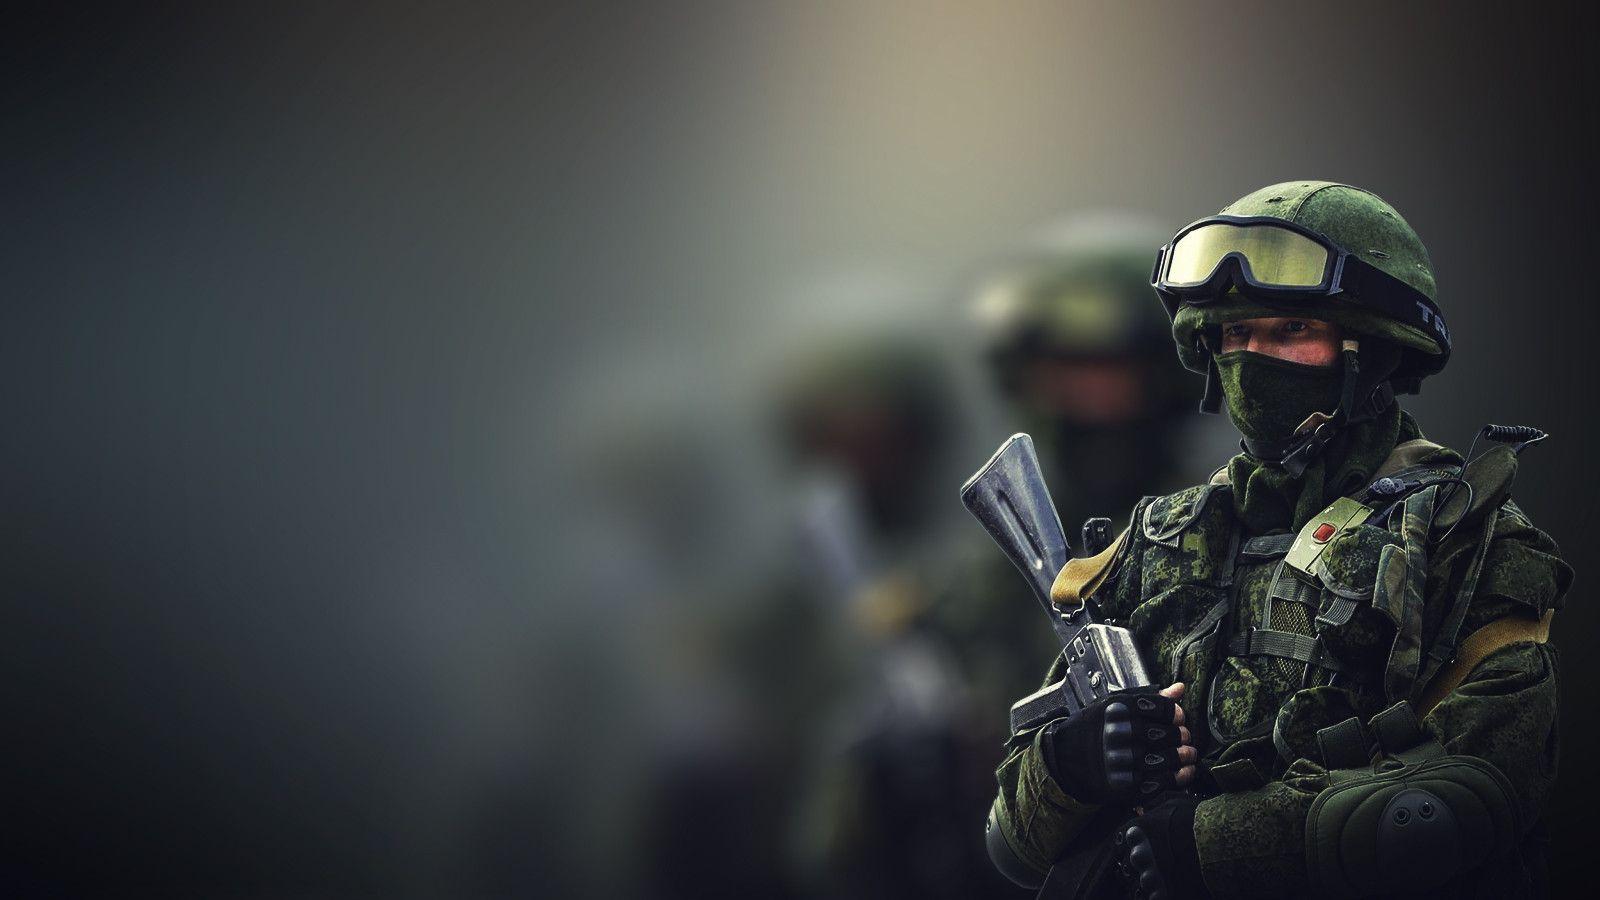 Download Soldier Wallpaper Hd Backgrounds Download Itlcat